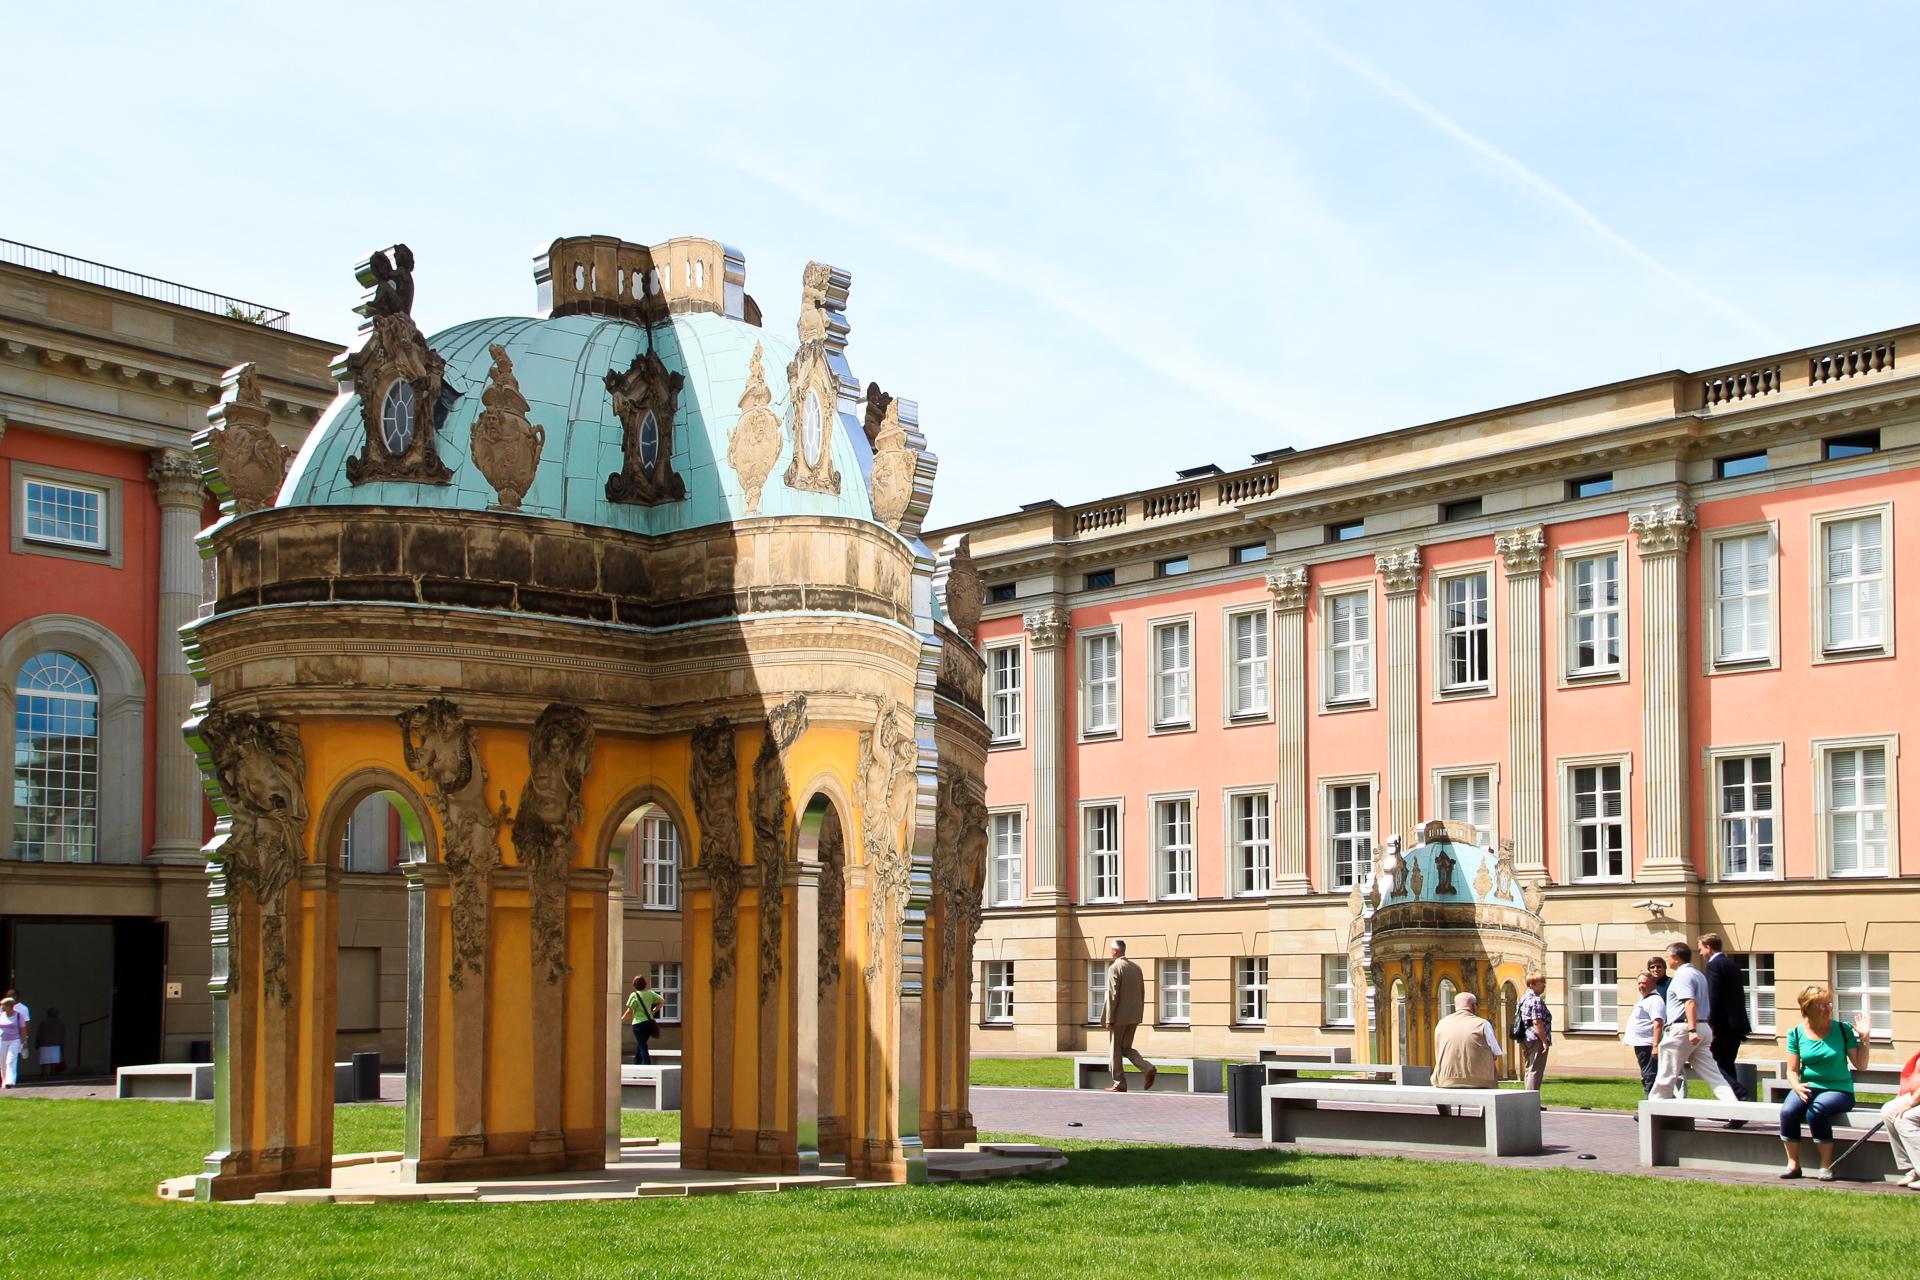 Zugabe – Schlosspavillon Potsdam